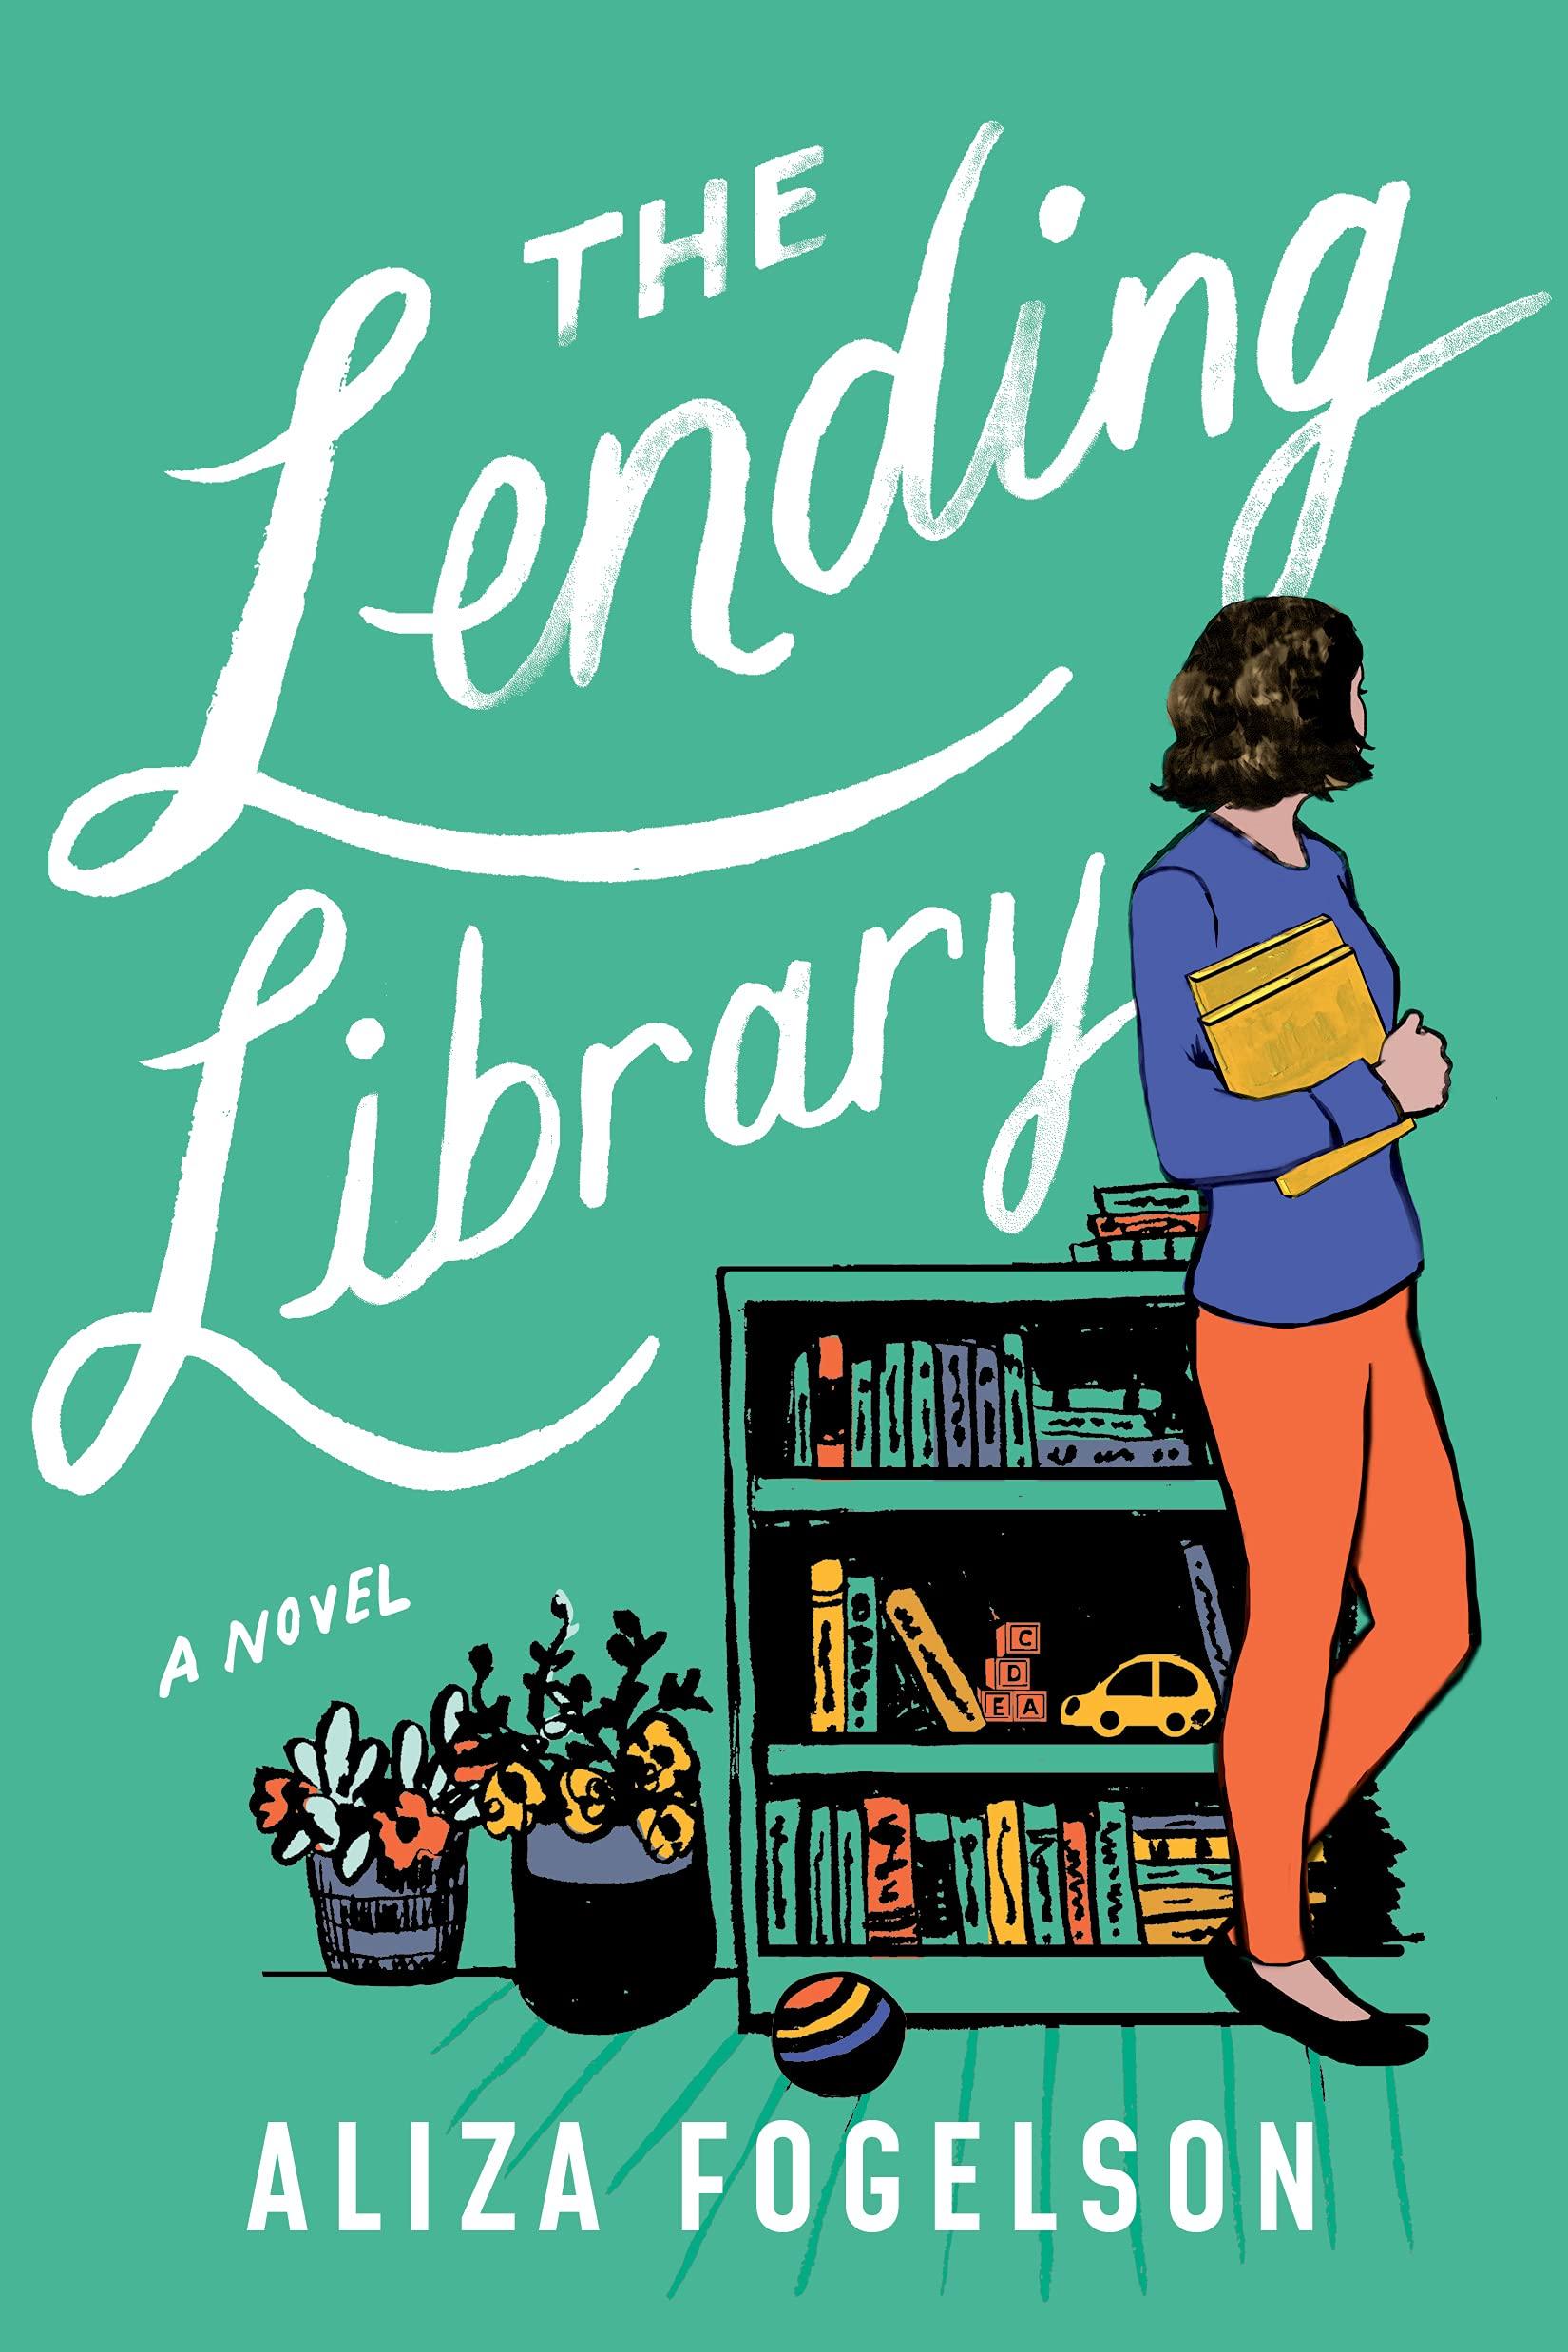 The Lending Library: A Novel: Fogelson, Aliza: 9781503904019: Amazon.com: Books